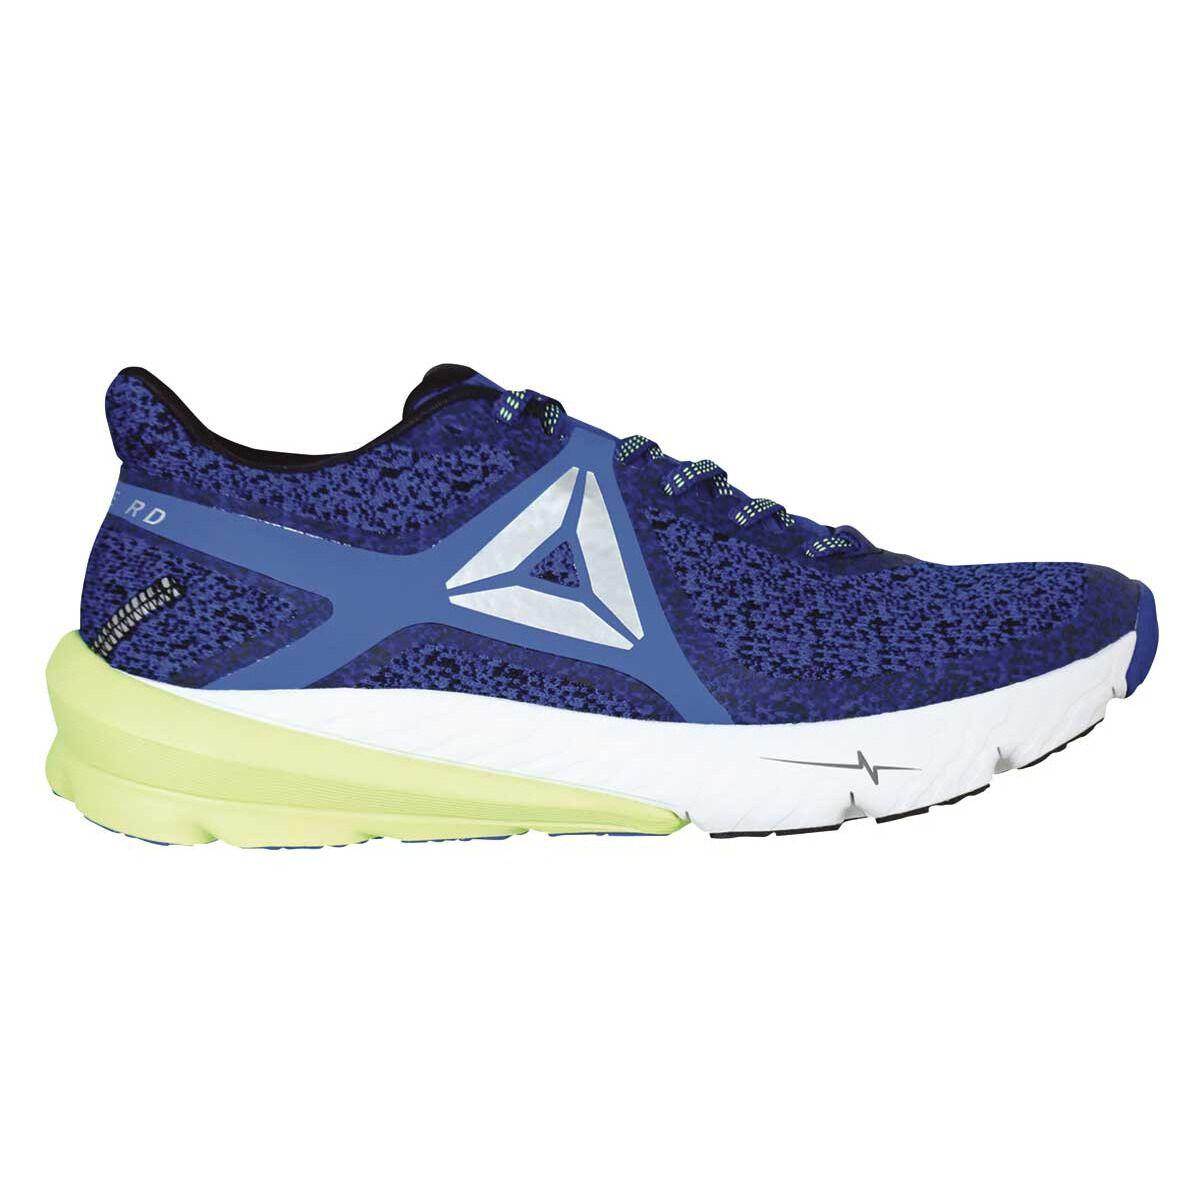 Reebok One Series Grasse Road Mens Running Shoes